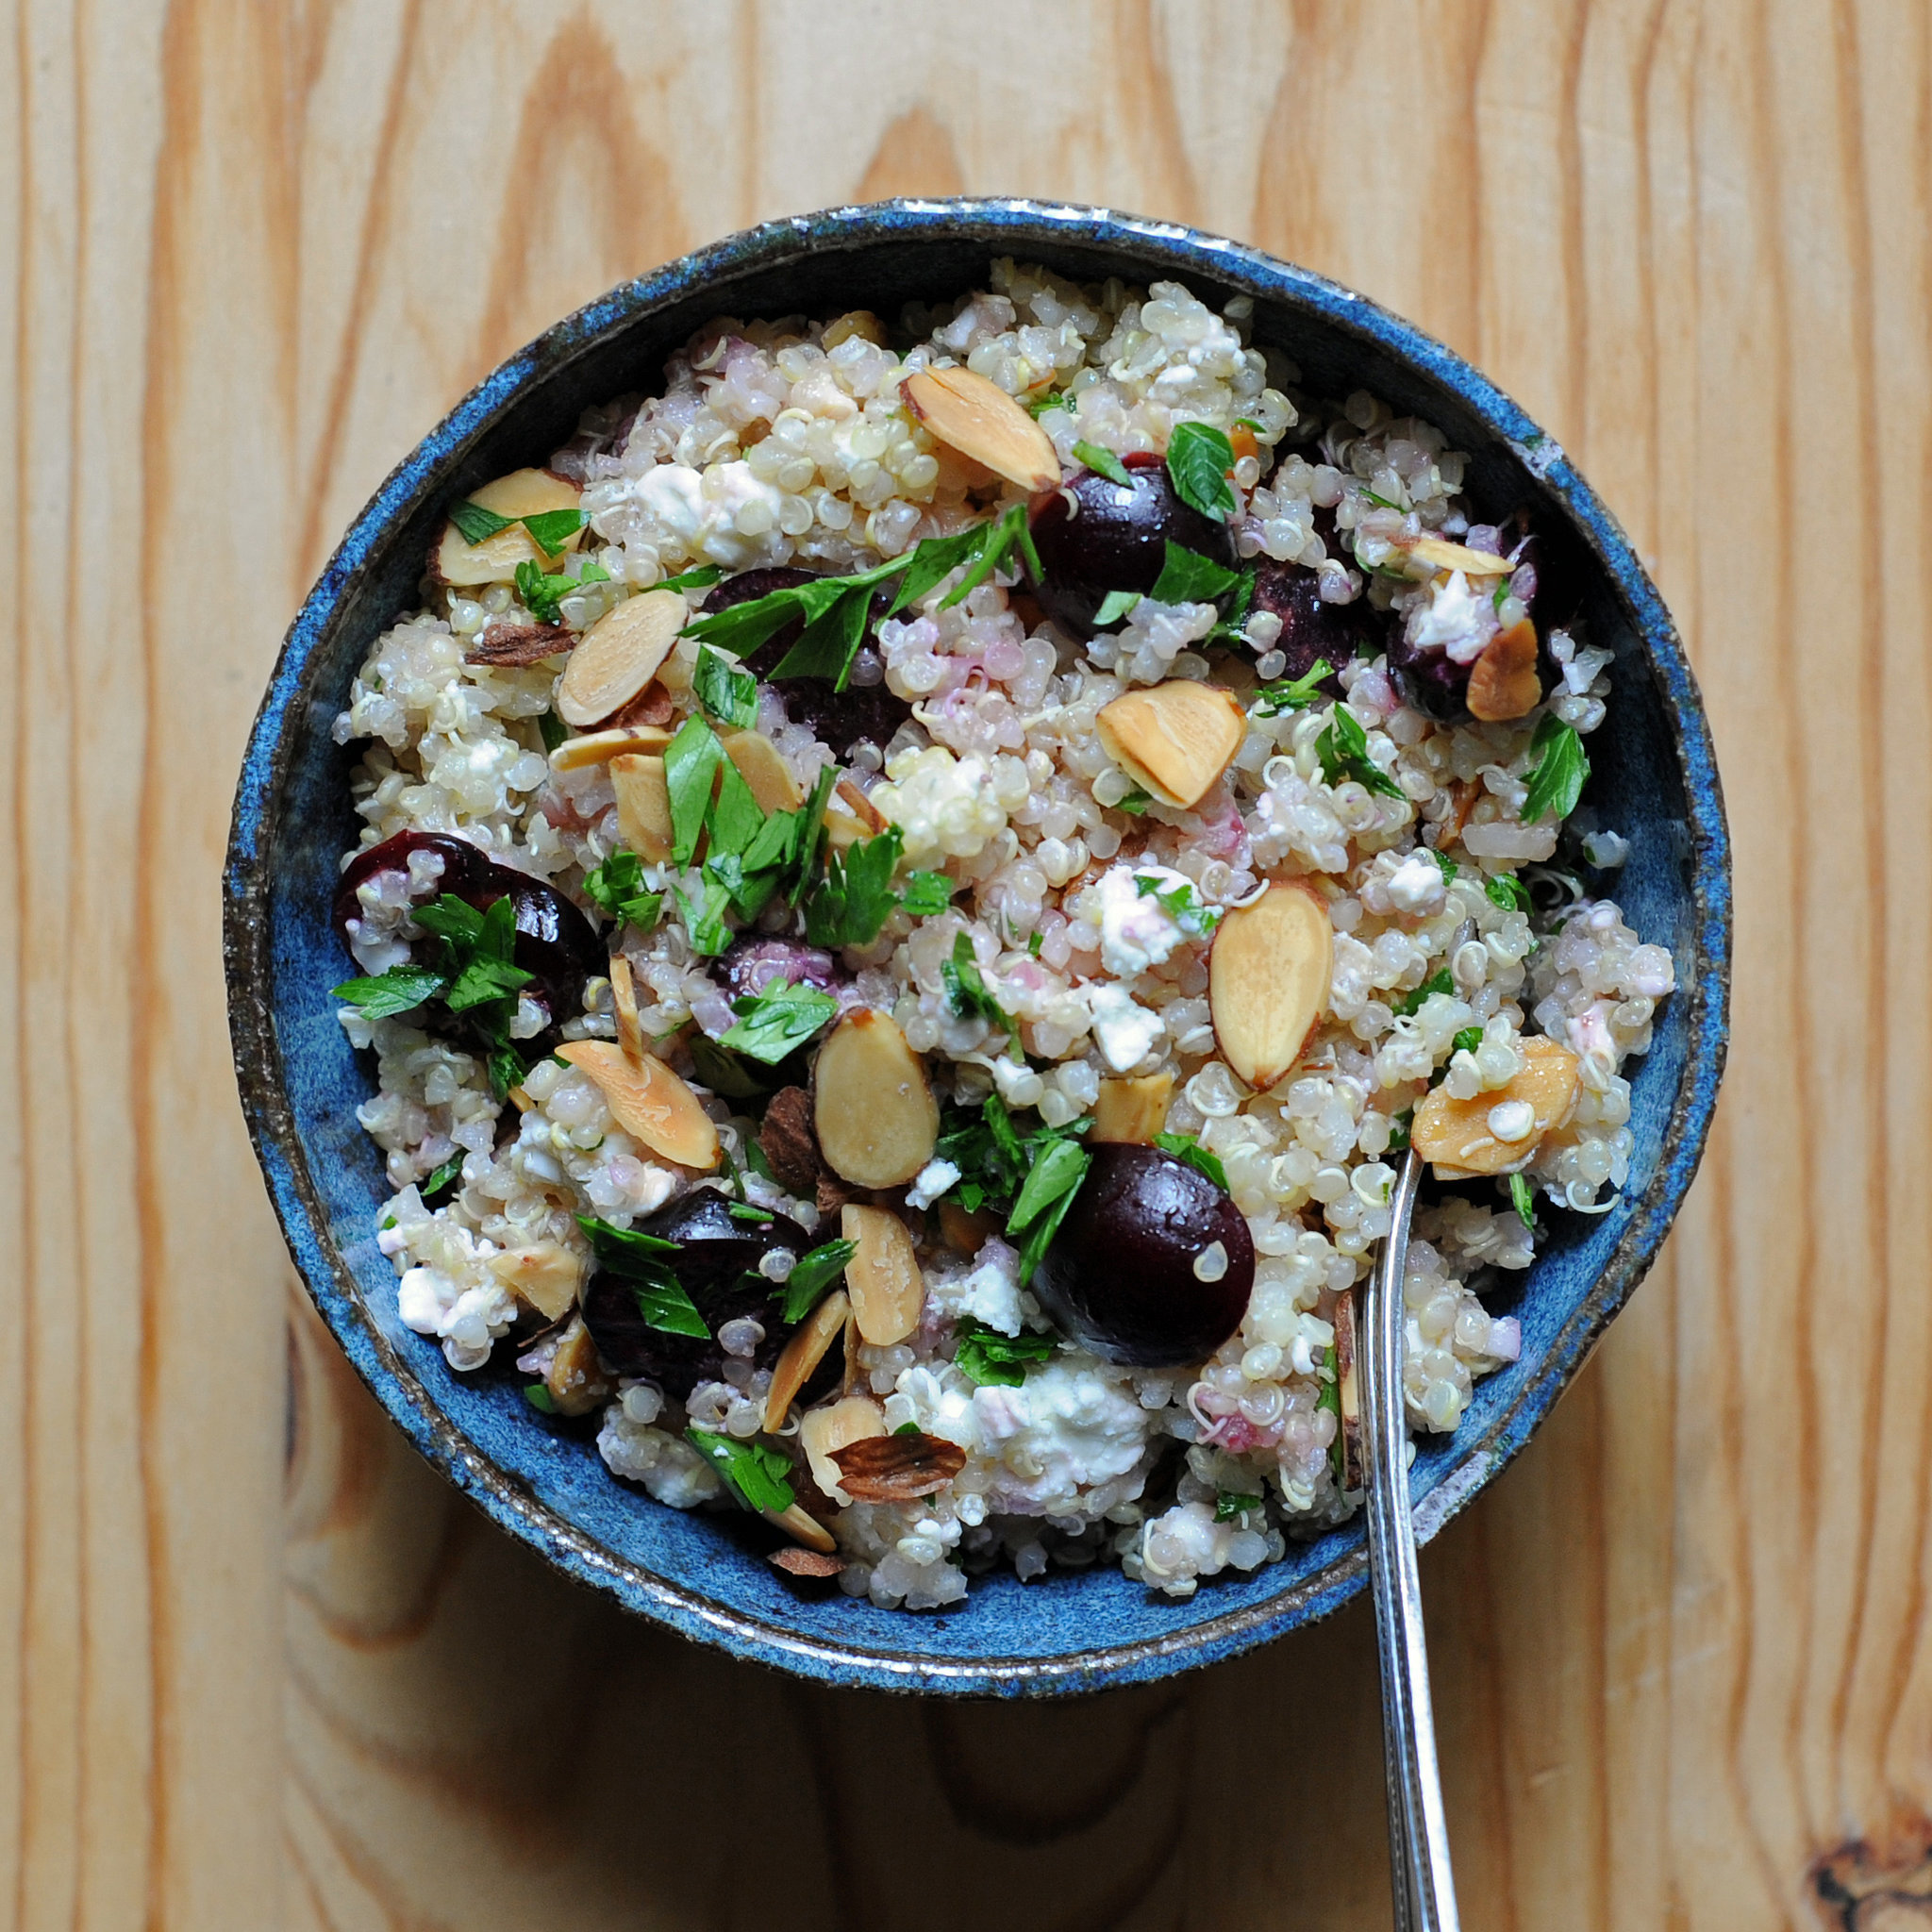 Quinoa Salad With Cherries and Feta